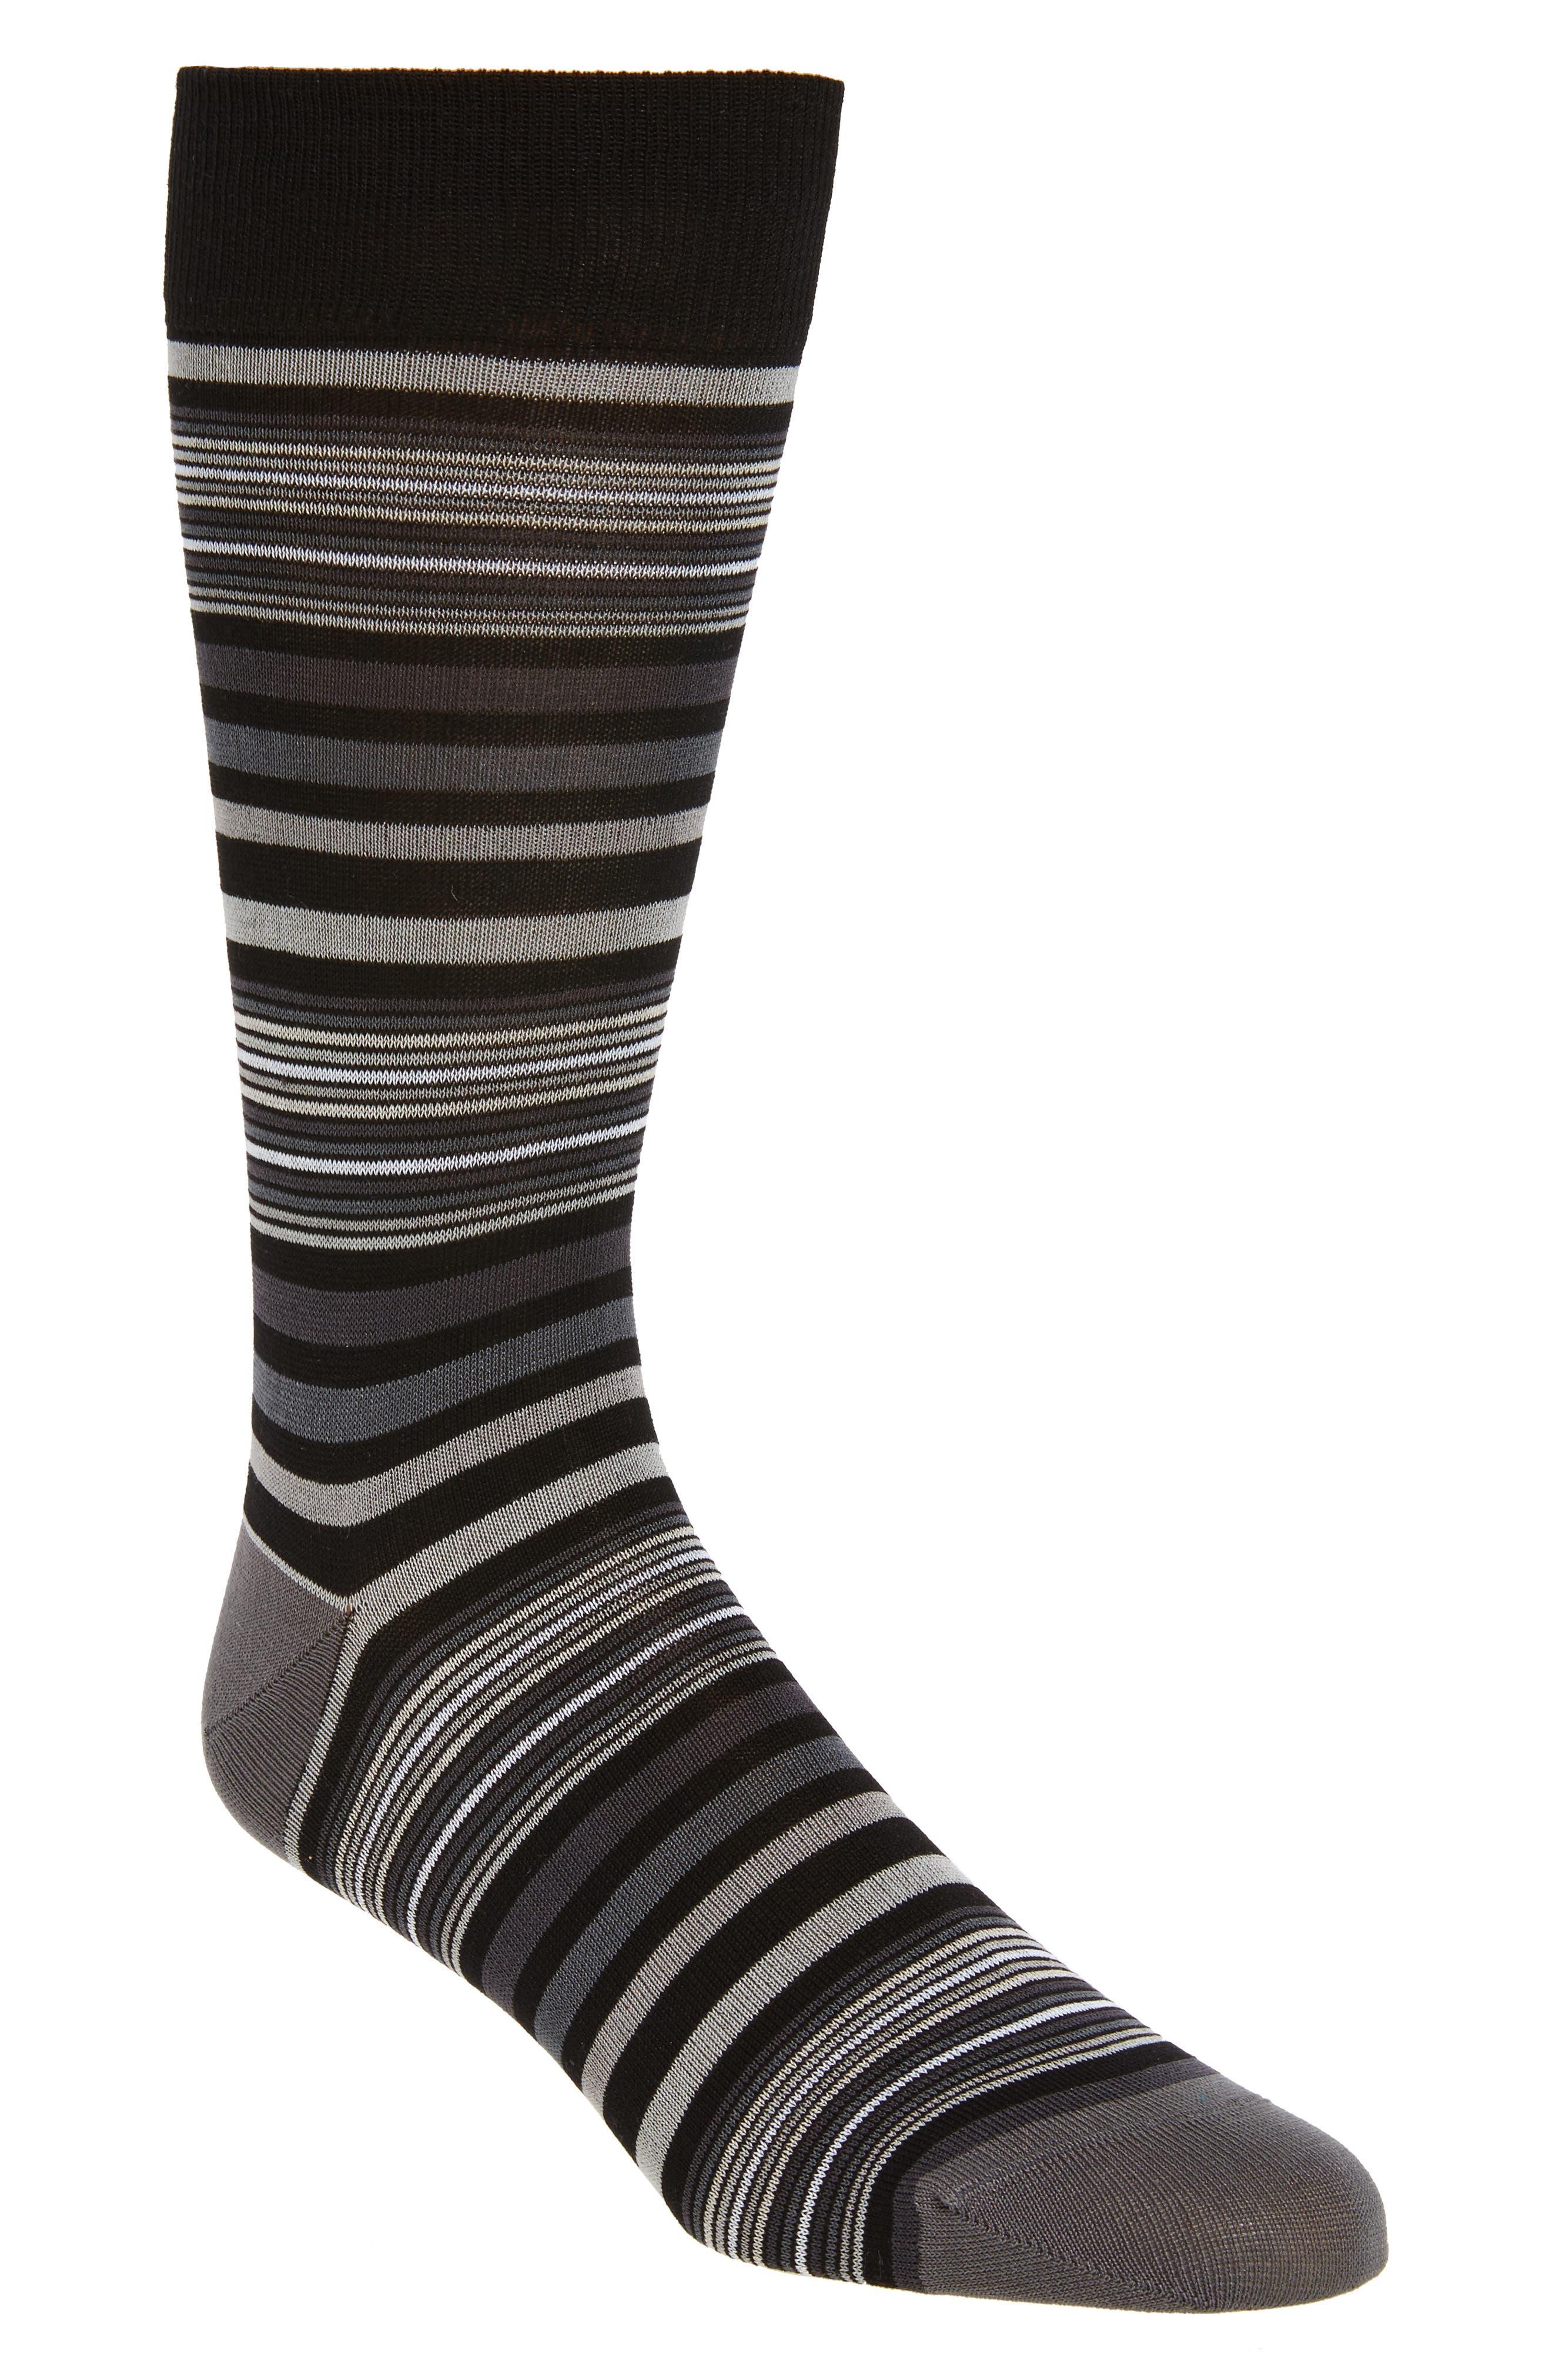 Alternate Image 1 Selected - Bugatchi Thin Stripe Crew Socks